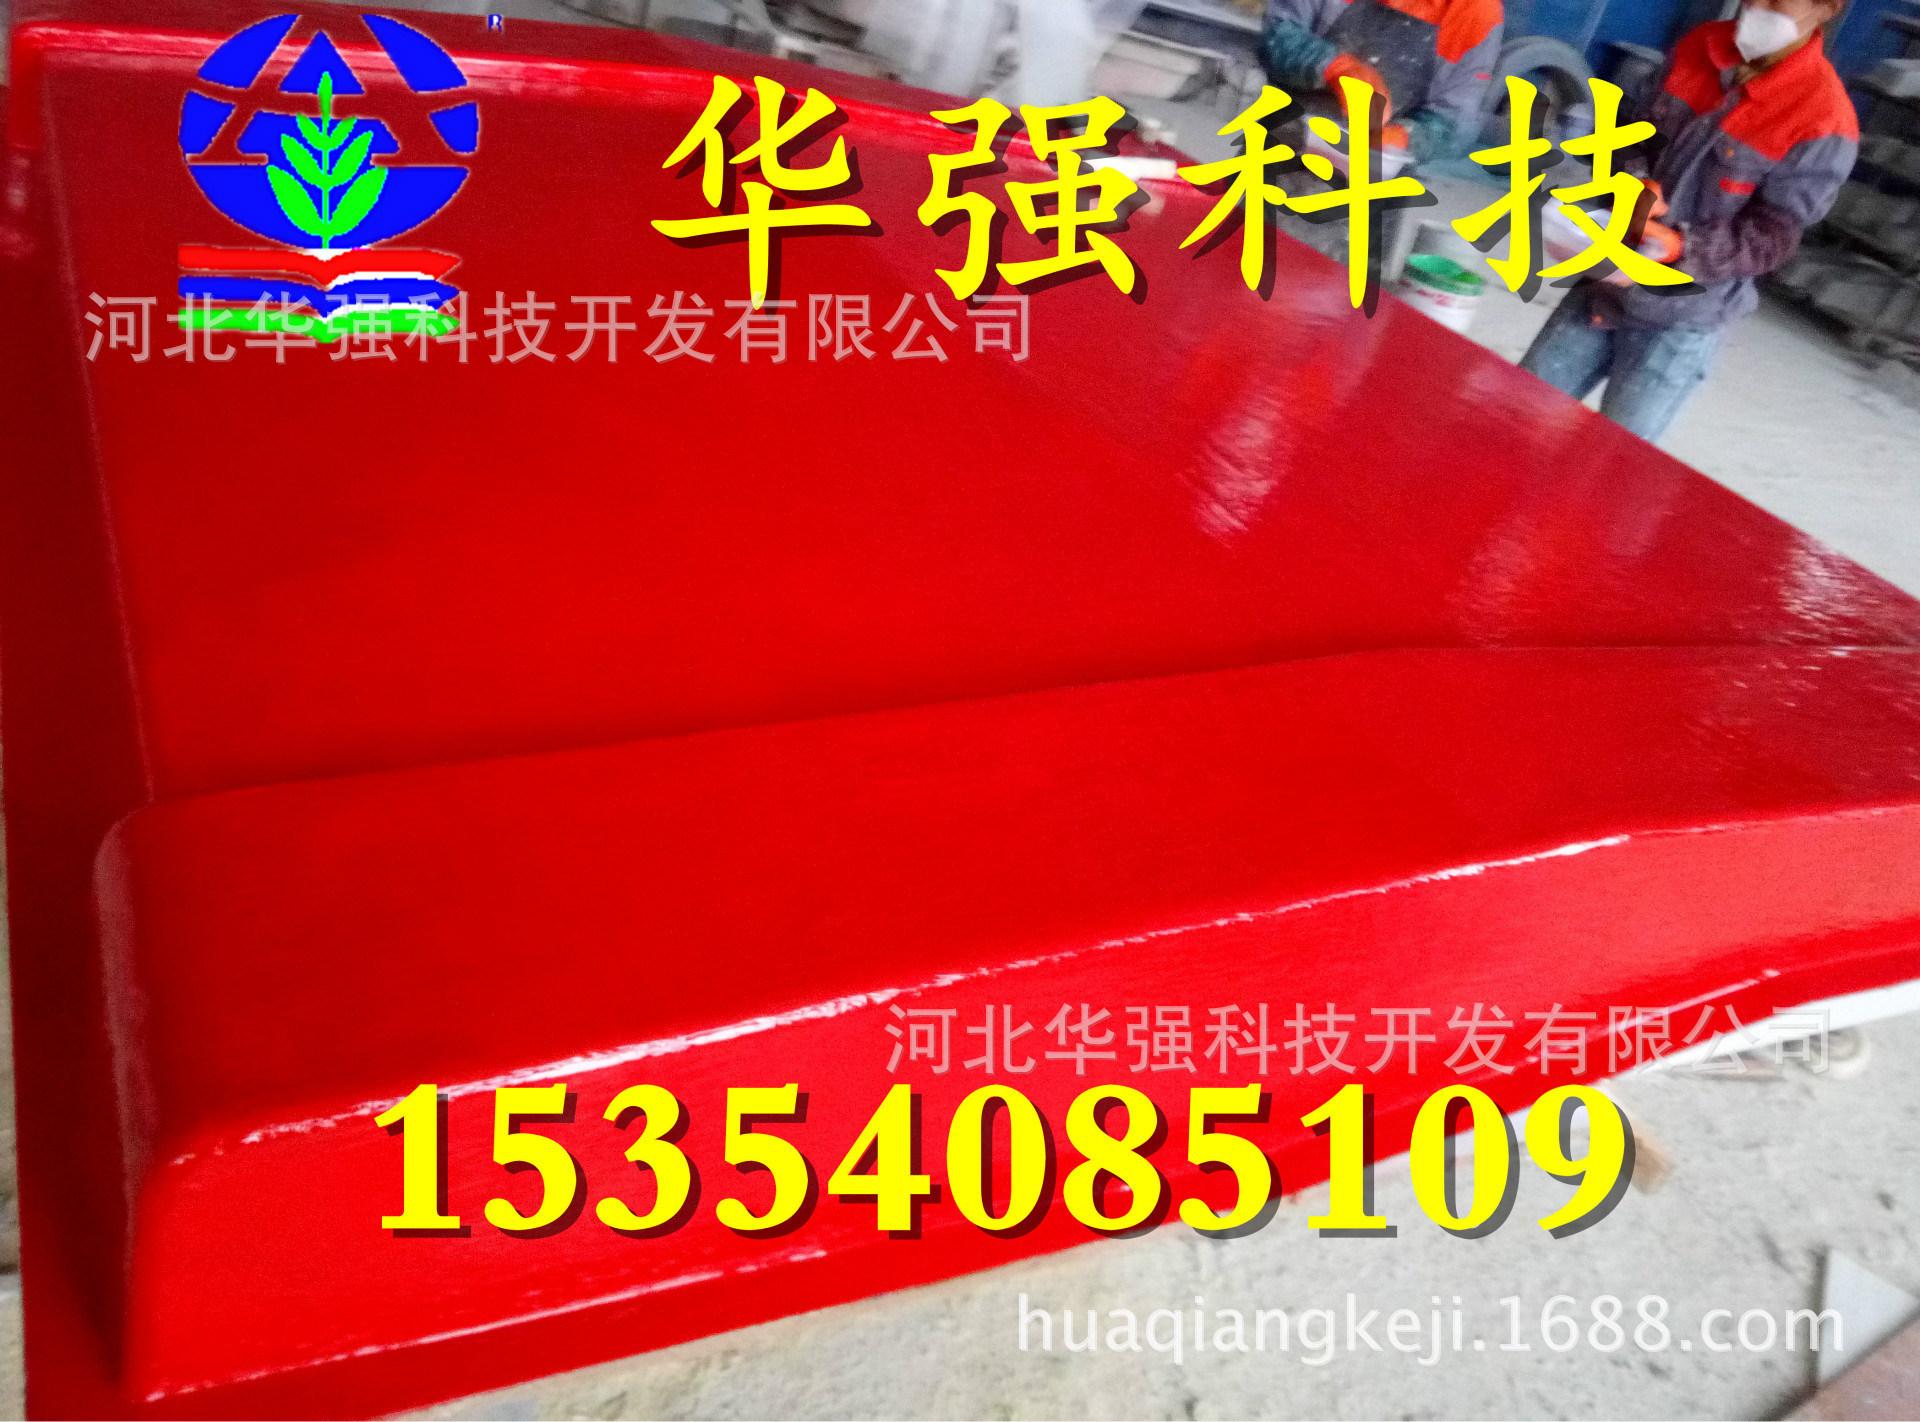 P61121-102658